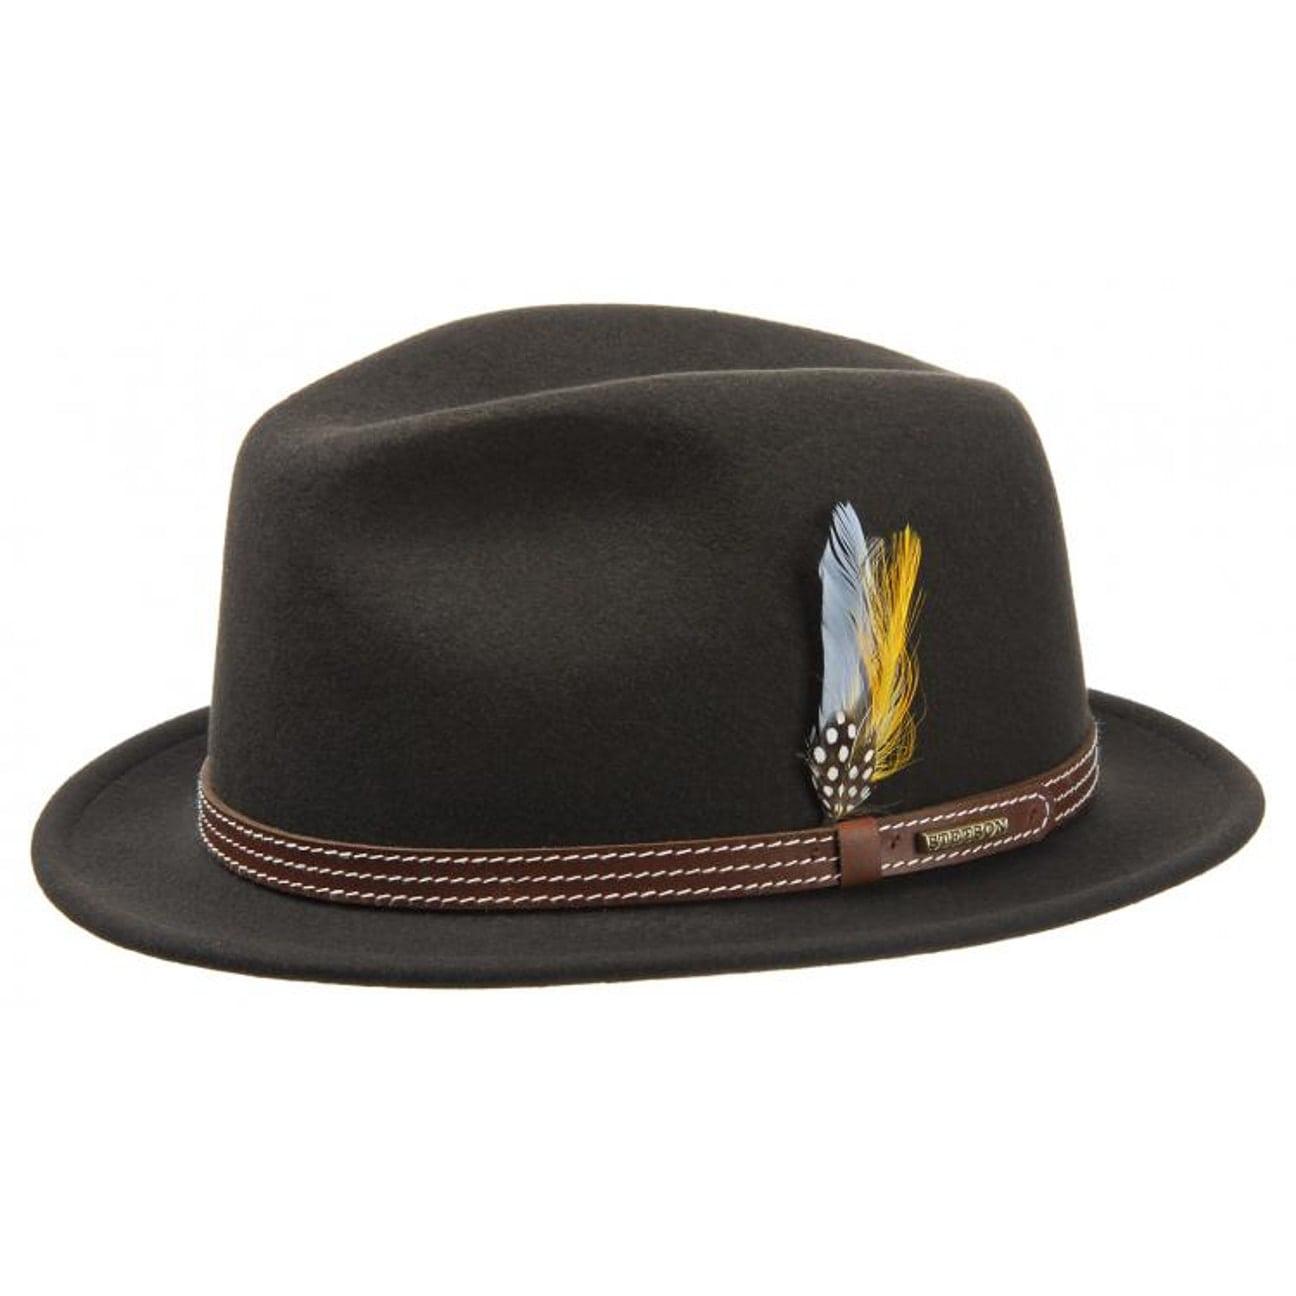 sombrero-vitafelt-vidor-by-stetson-traveller